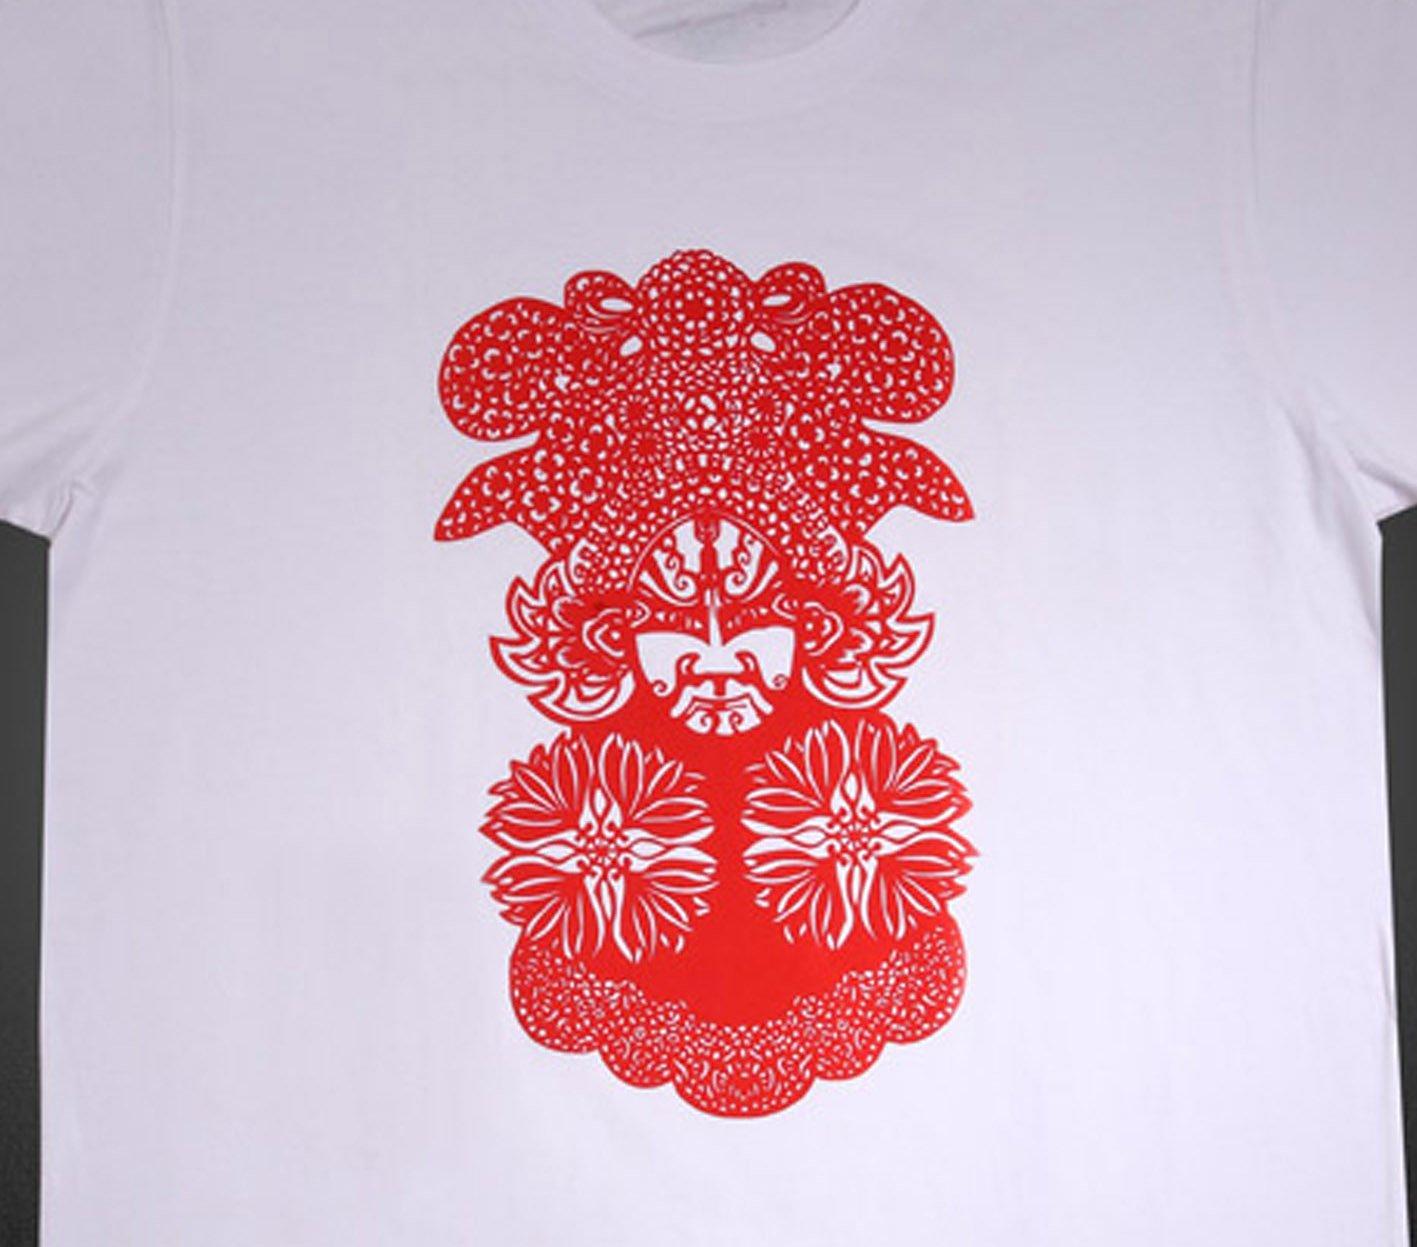 Opera Facial Makeup Graphic T-Shirts for Men, New Tee  (Men's XL)